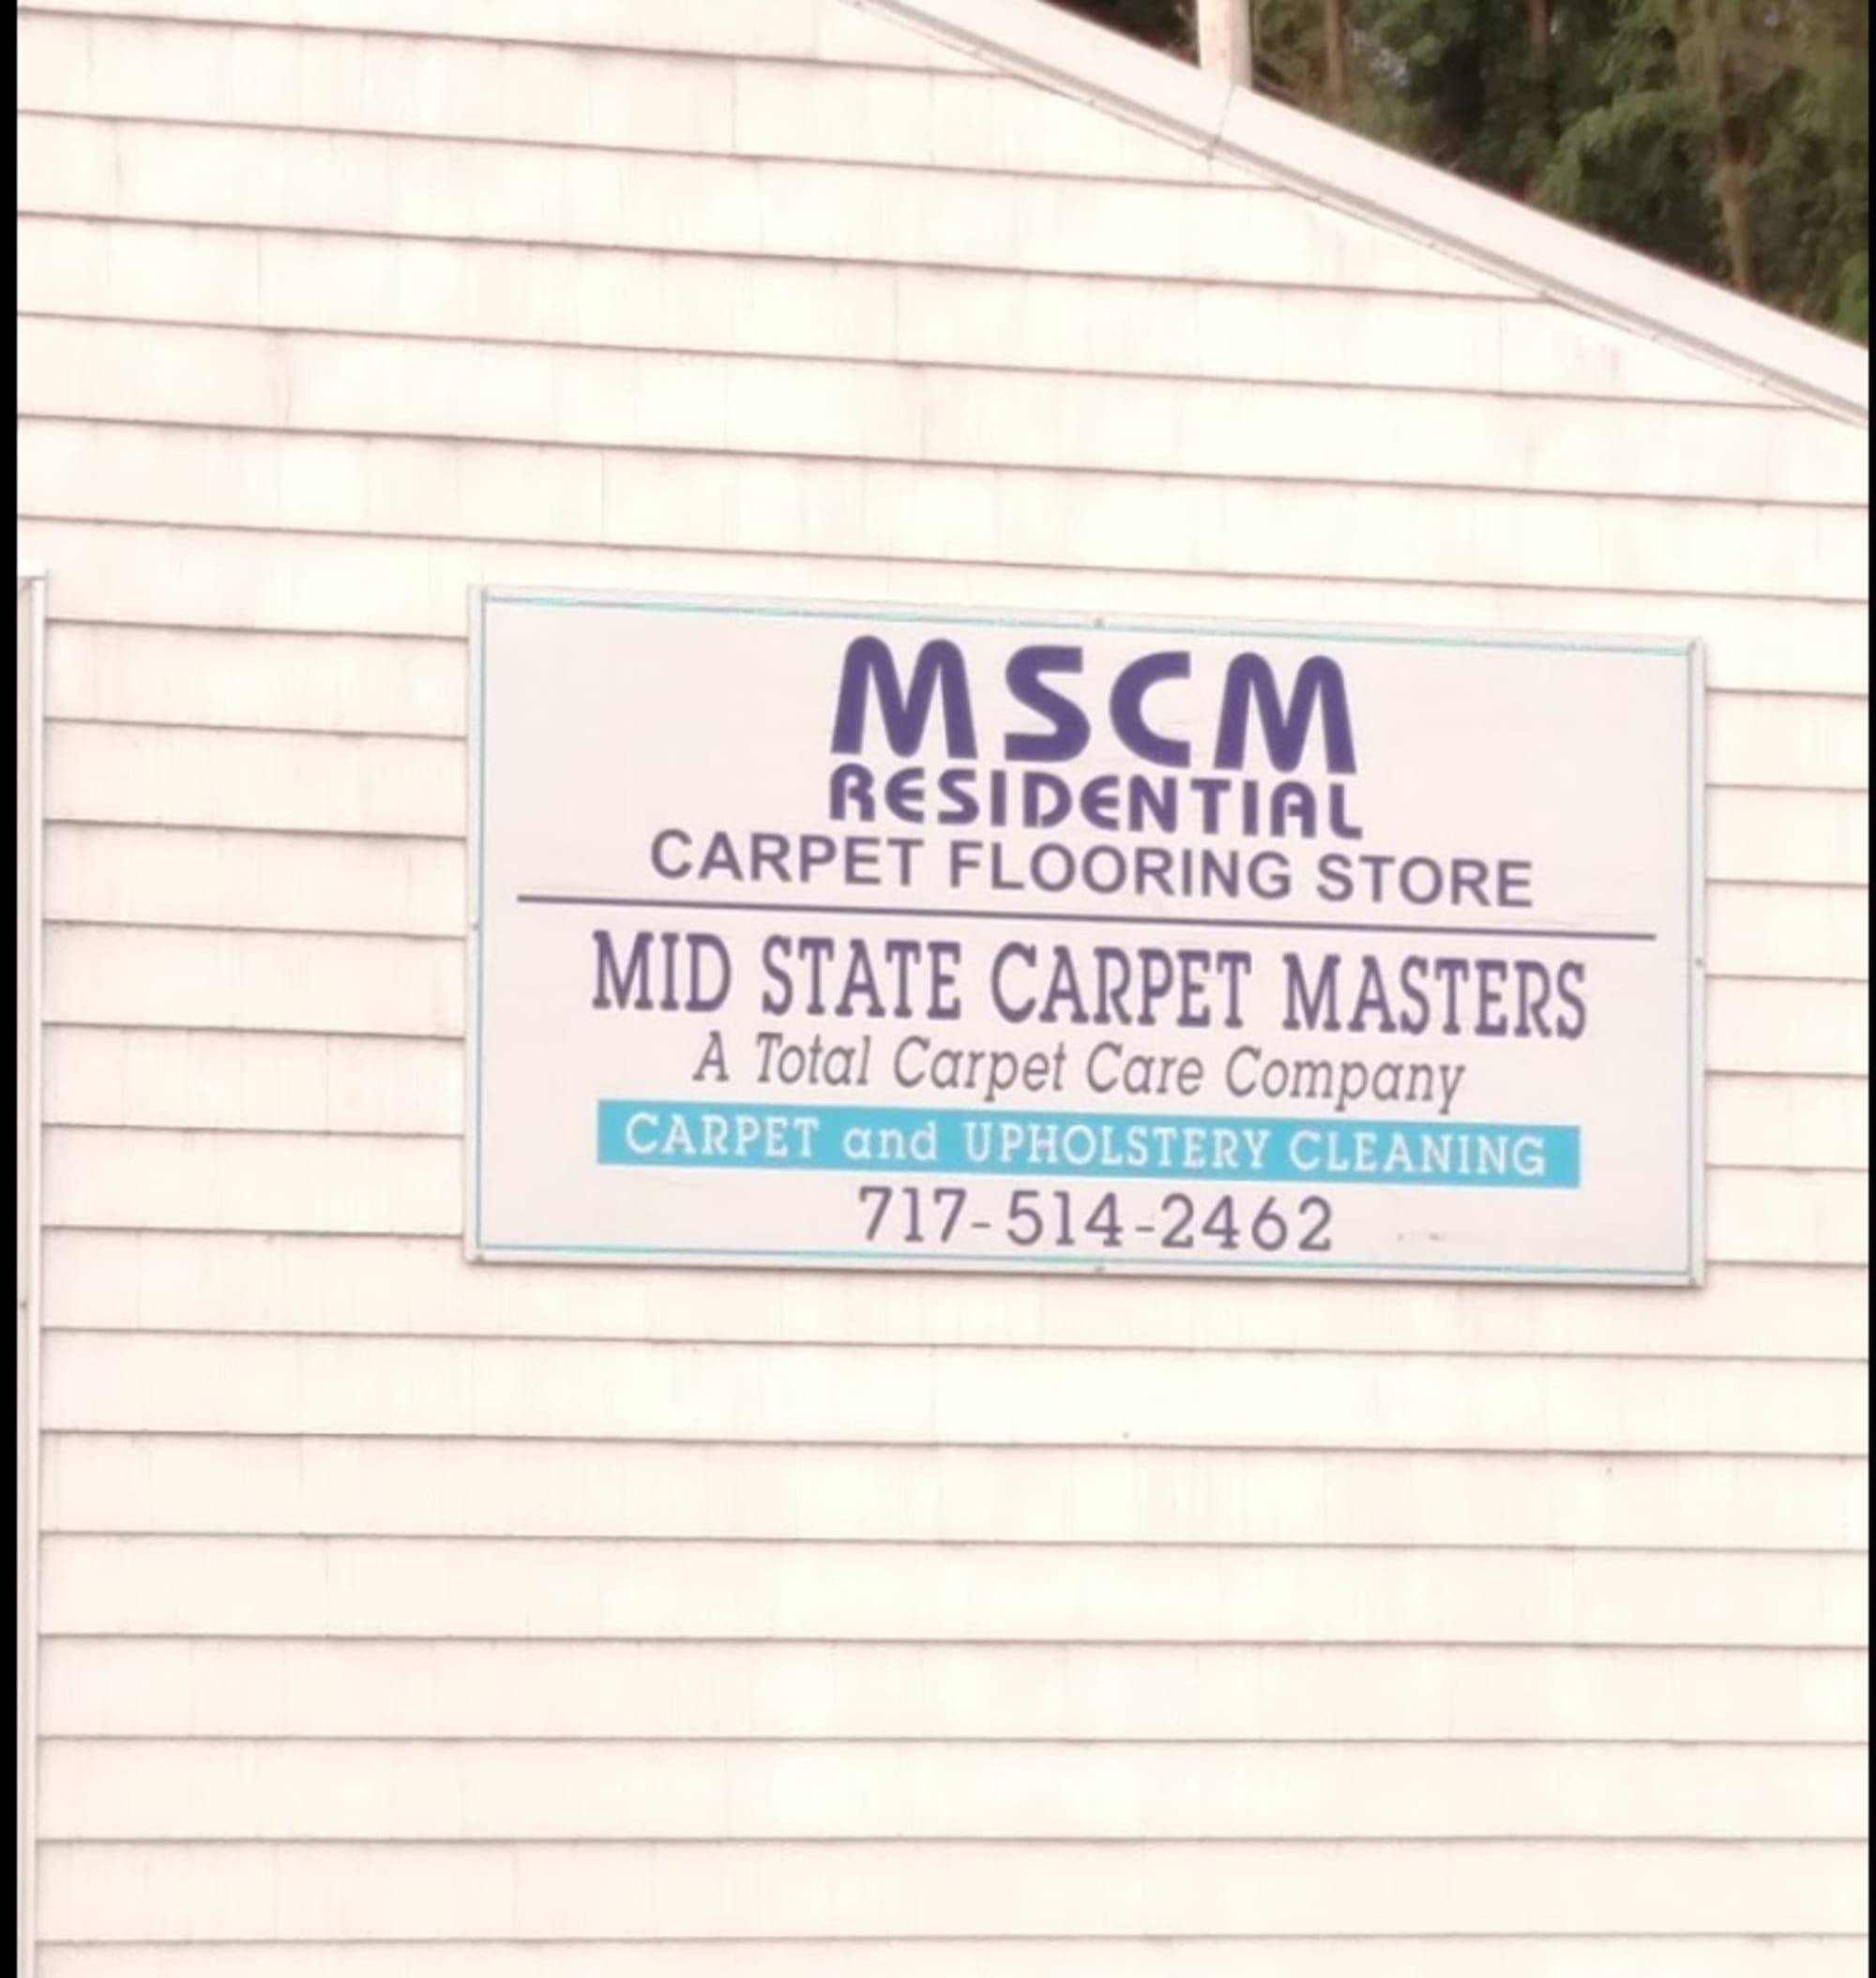 Mid State Carpet Masters - 528 Oak St Lemoyne, PA 17043